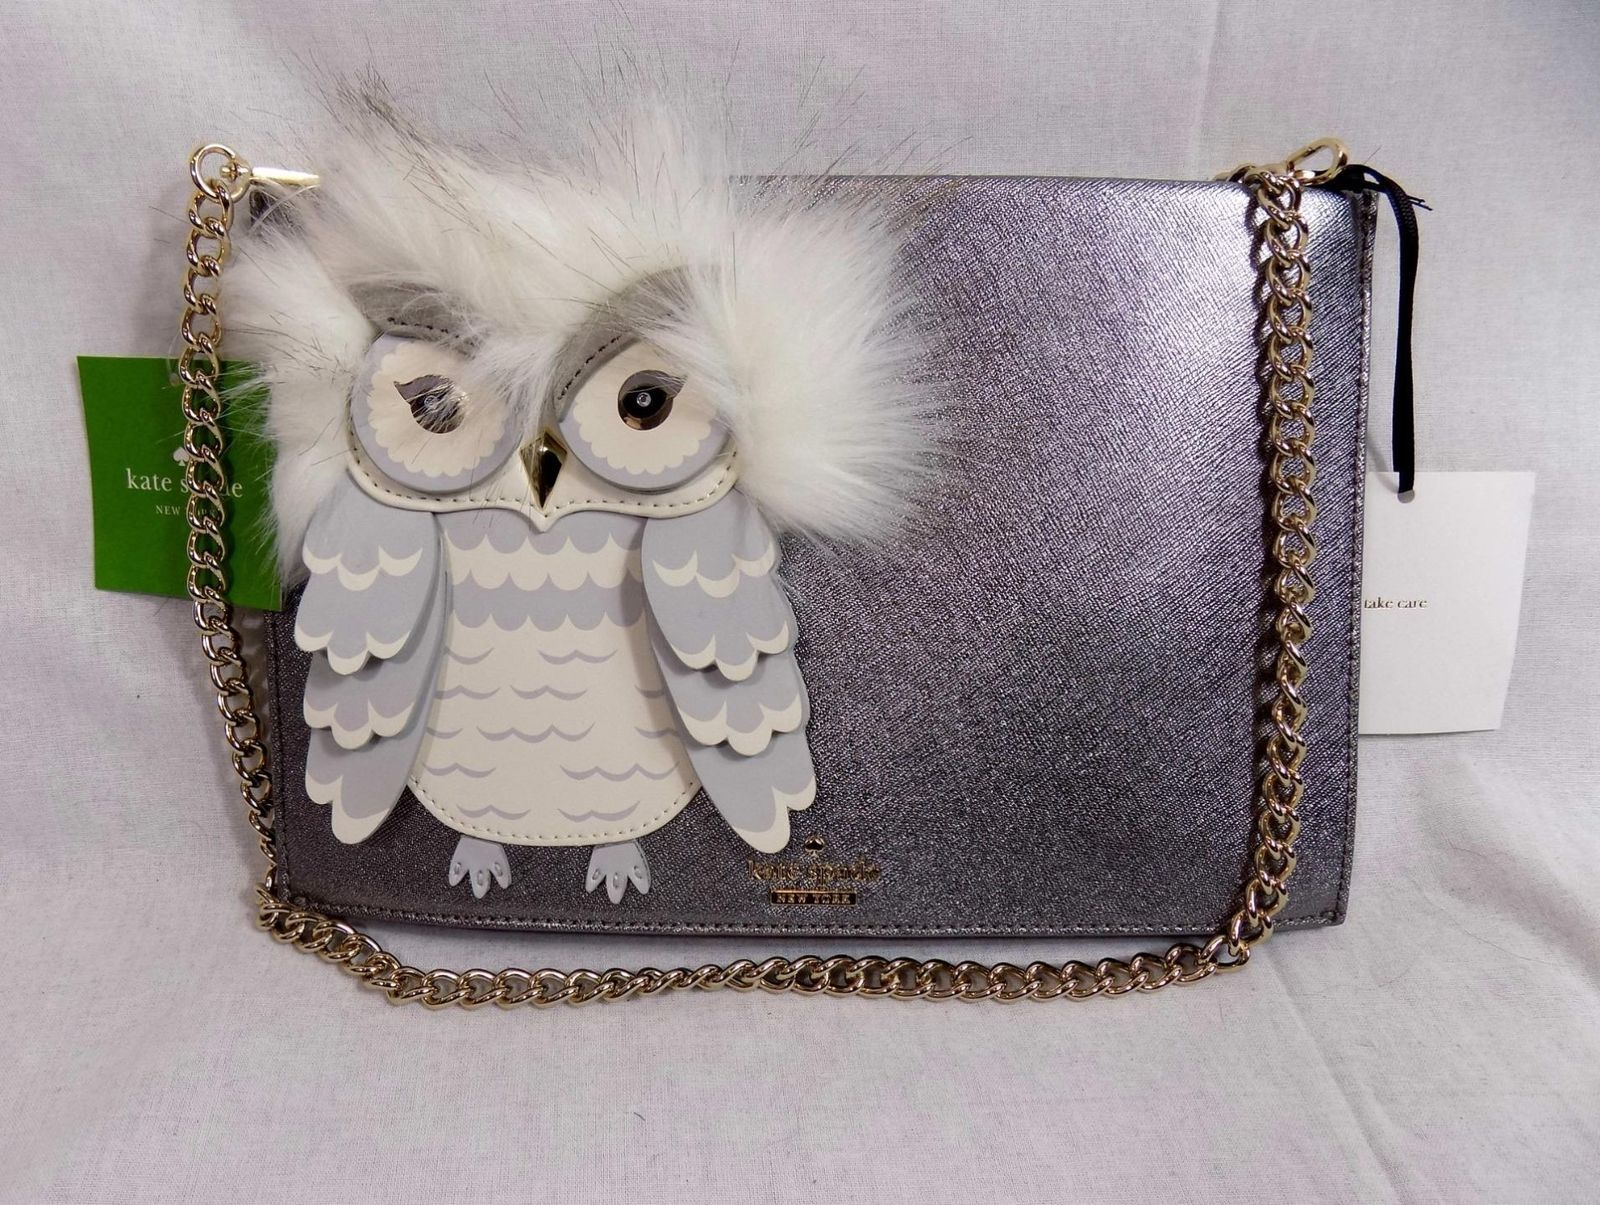 2e857ddbc Kate Spade Handbag Star Bright Owl Sima and 50 similar items. S l1600